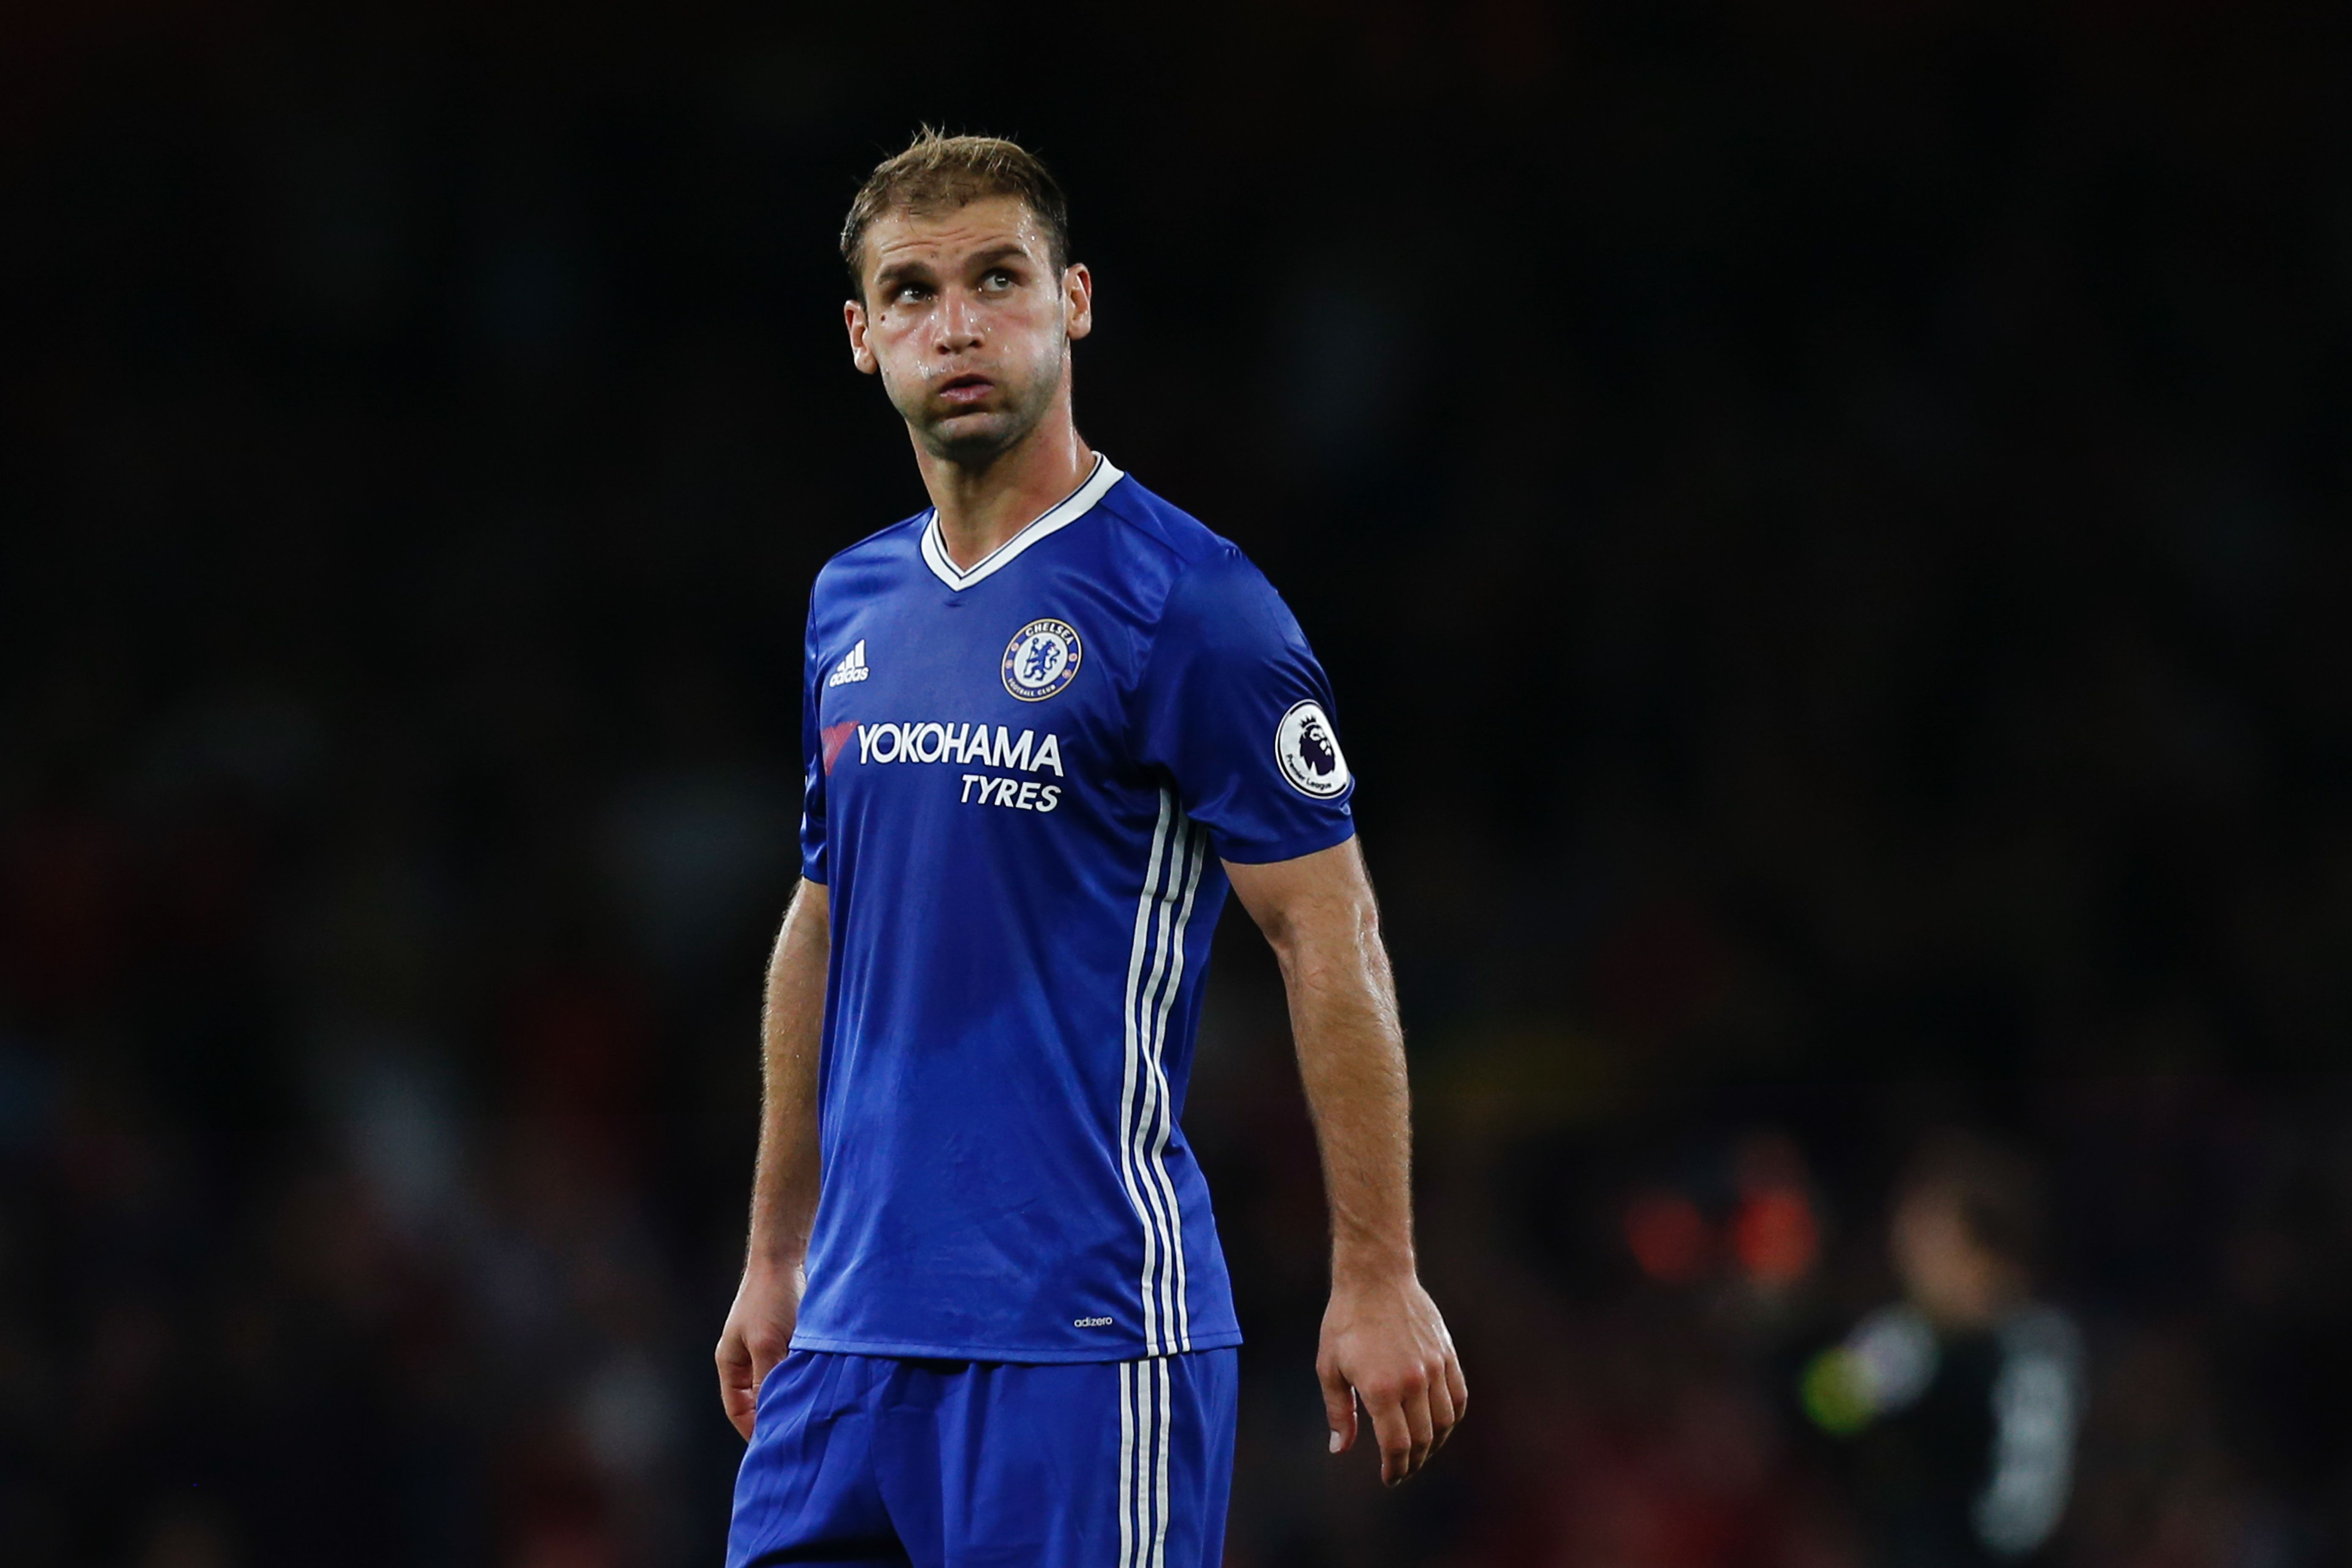 Chelsea star Branislav Ivanovic vows to fight for starting spot under Antonio Conte